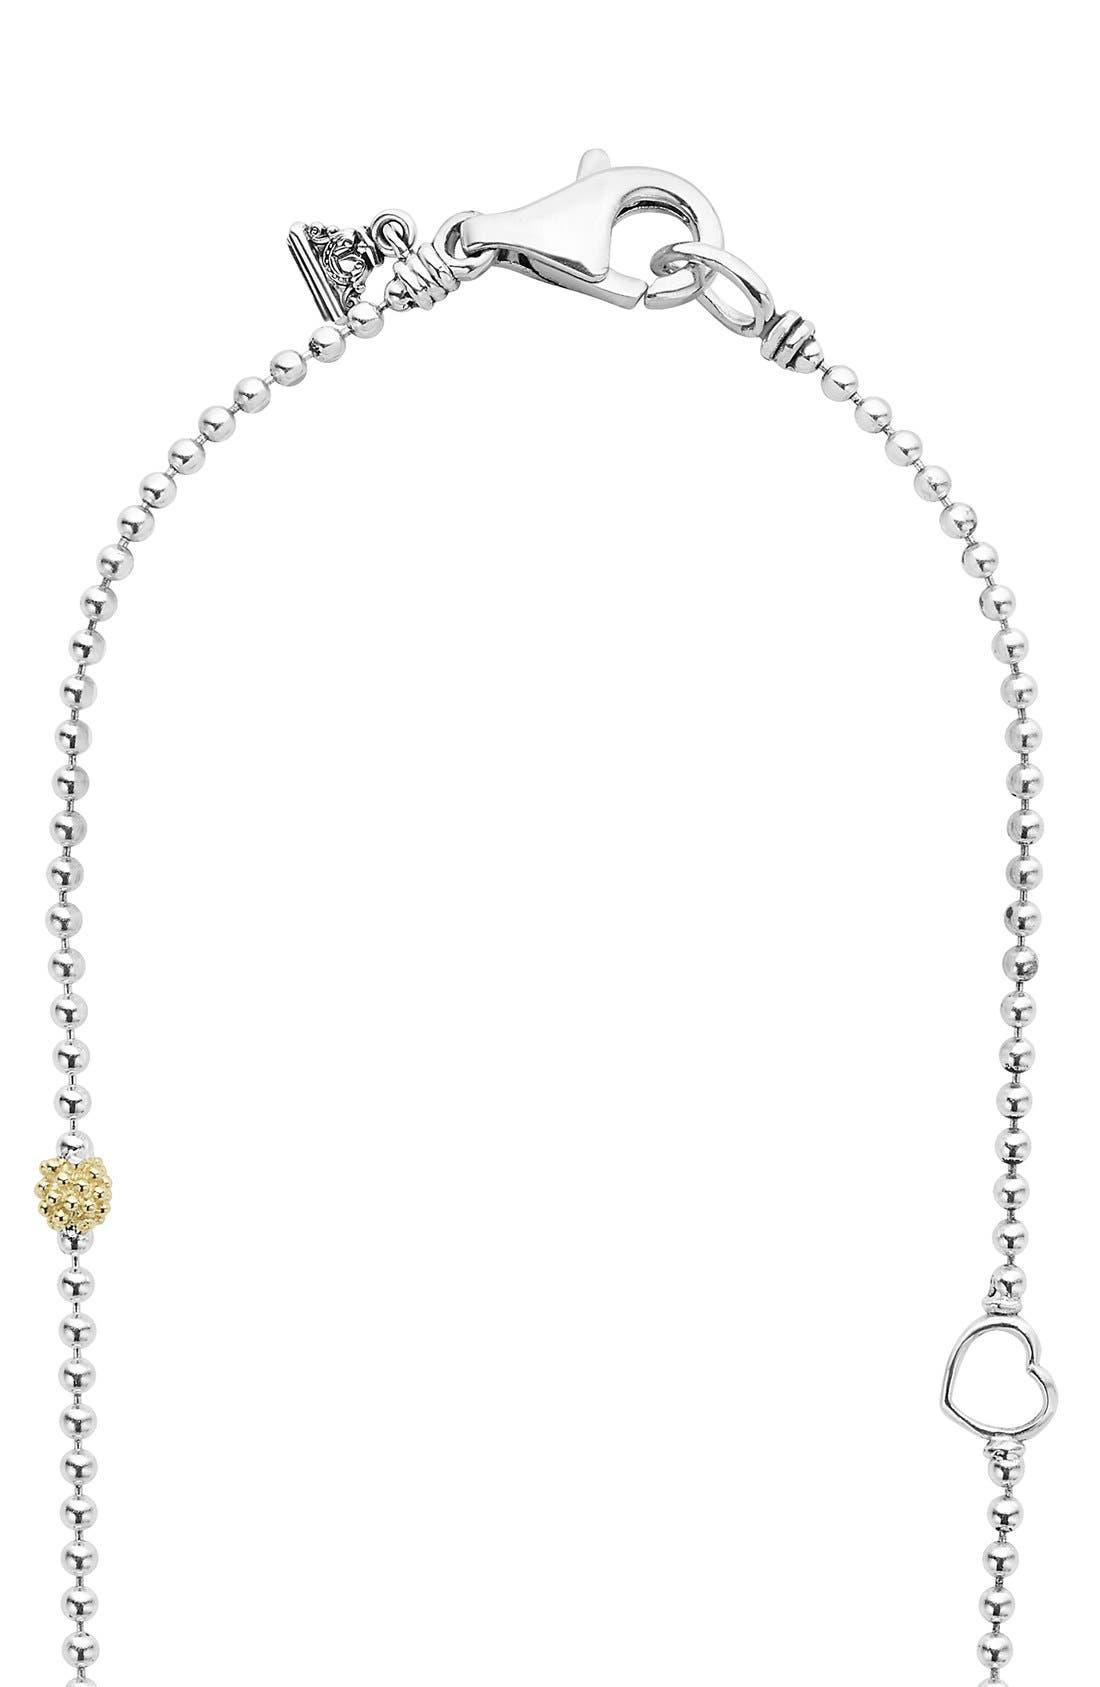 'Caviar Icon' Chain Necklace,                             Alternate thumbnail 4, color,                             SILVER/ GOLD